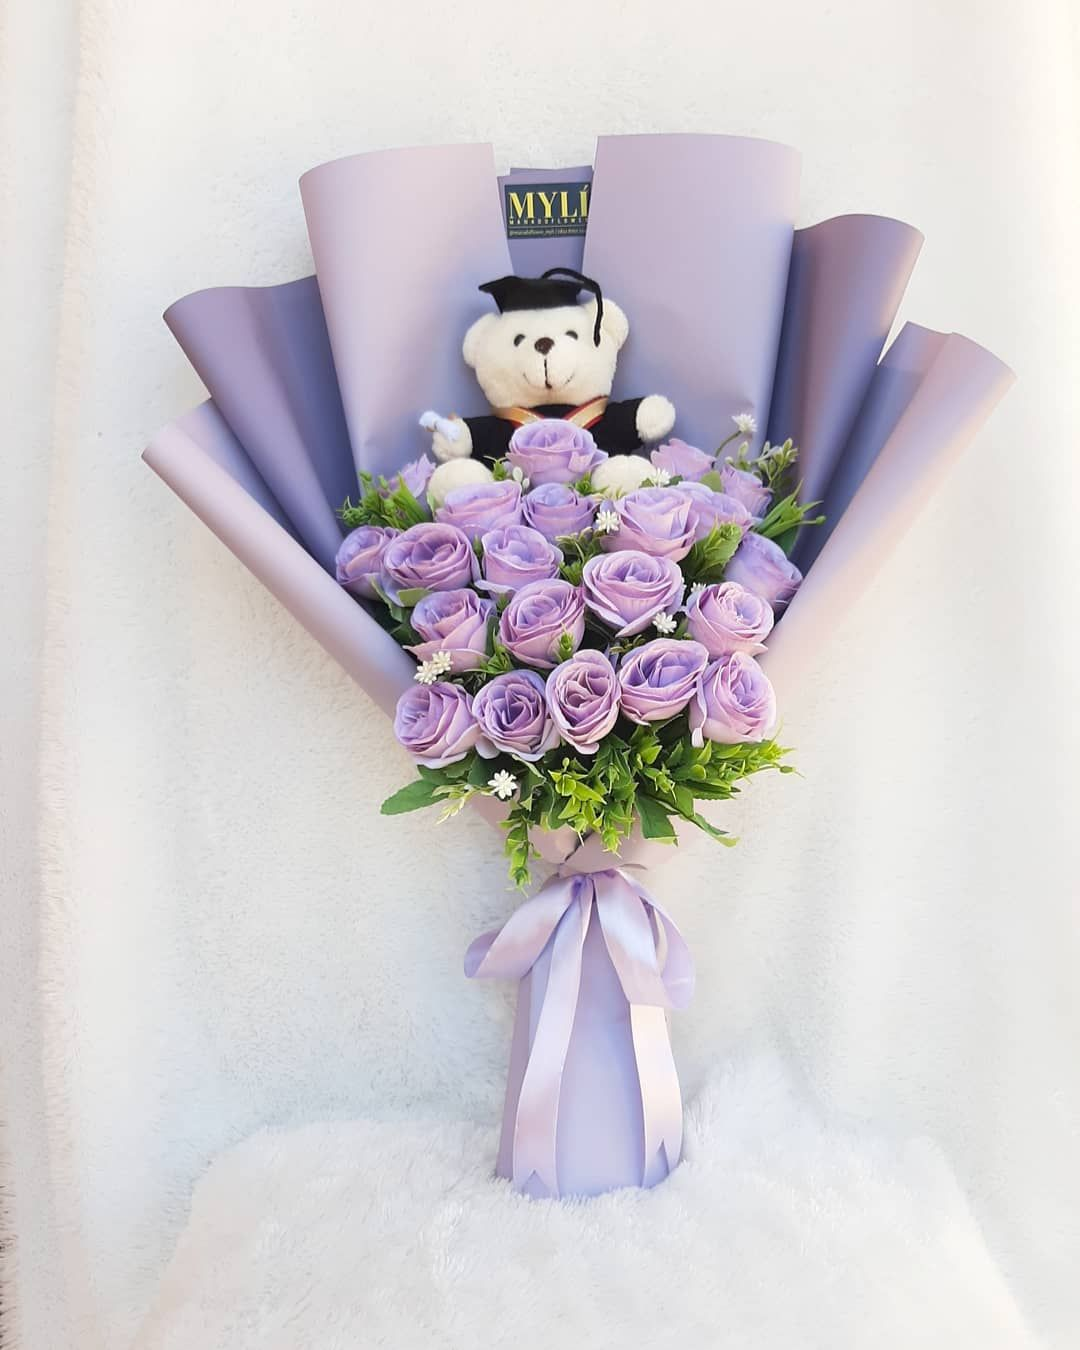 Material Artificial Flower Size L Doll Order Info Wa 082289592444 Klik Link Contact On Bio Shopee Balon Suslemeleri Cicekci Dukkanlari Balon Buketi